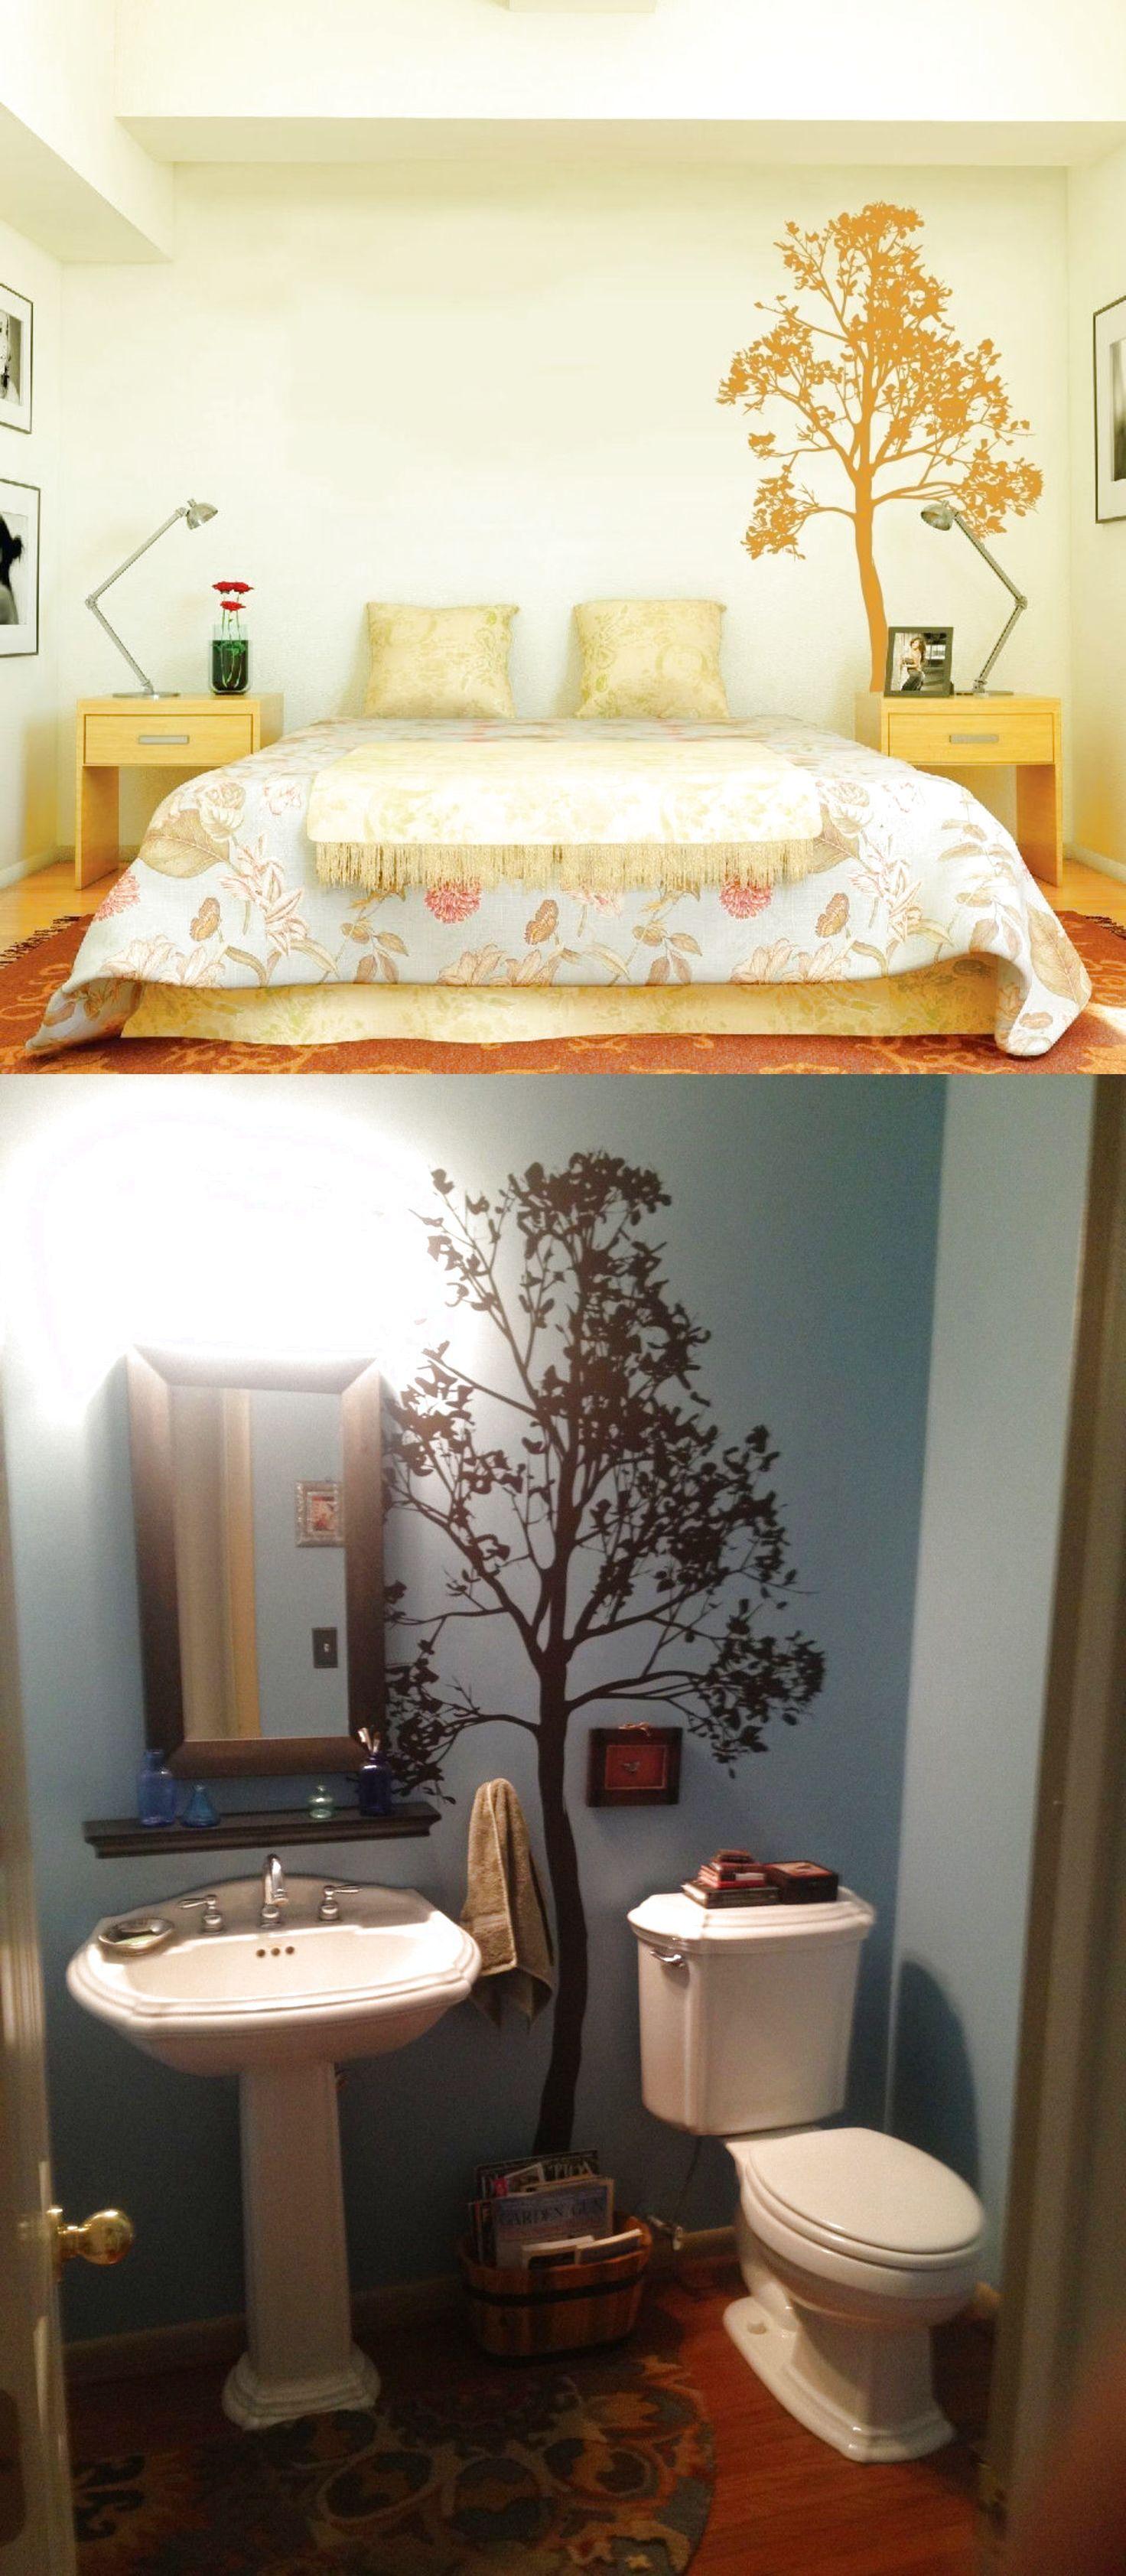 Simple tree large wall decal forest vinyl sticker nursery art